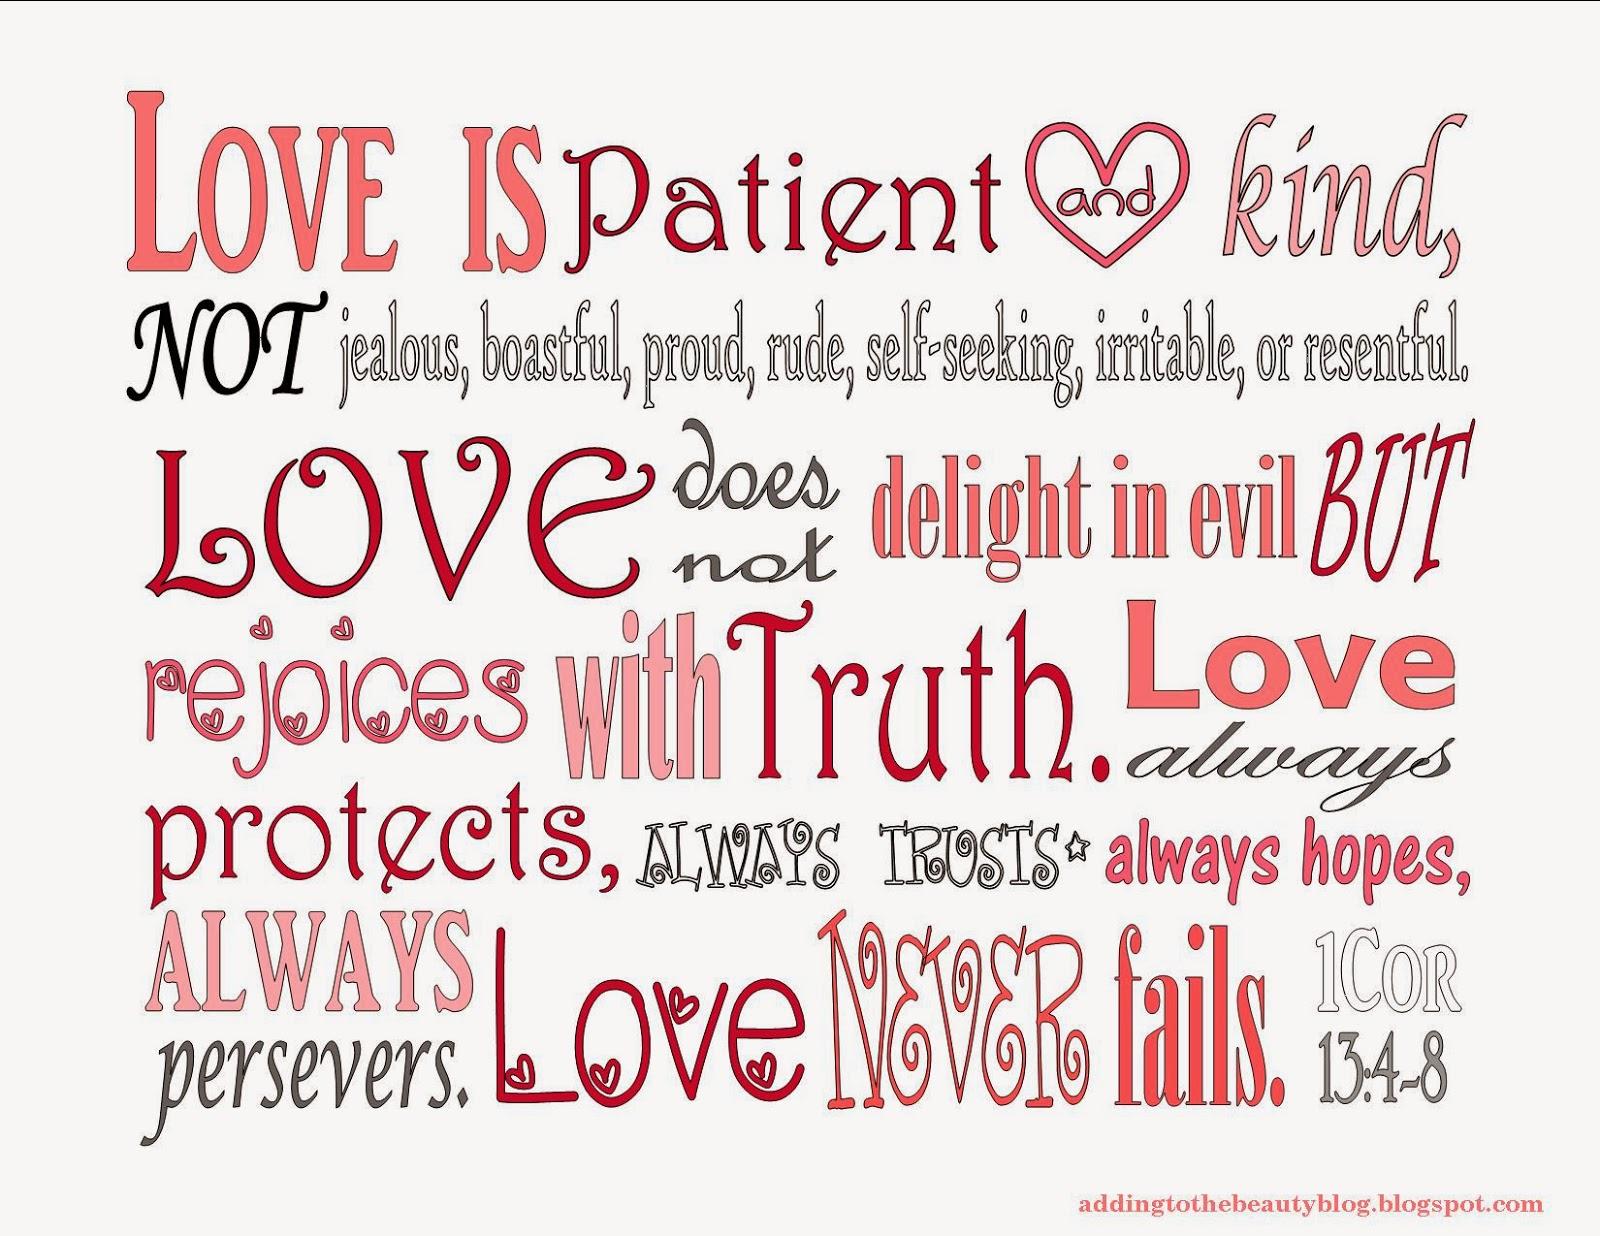 Love Is Patient Iphone Wallpaper : 1 corinthians 13 Wallpaper - WallpaperSafari